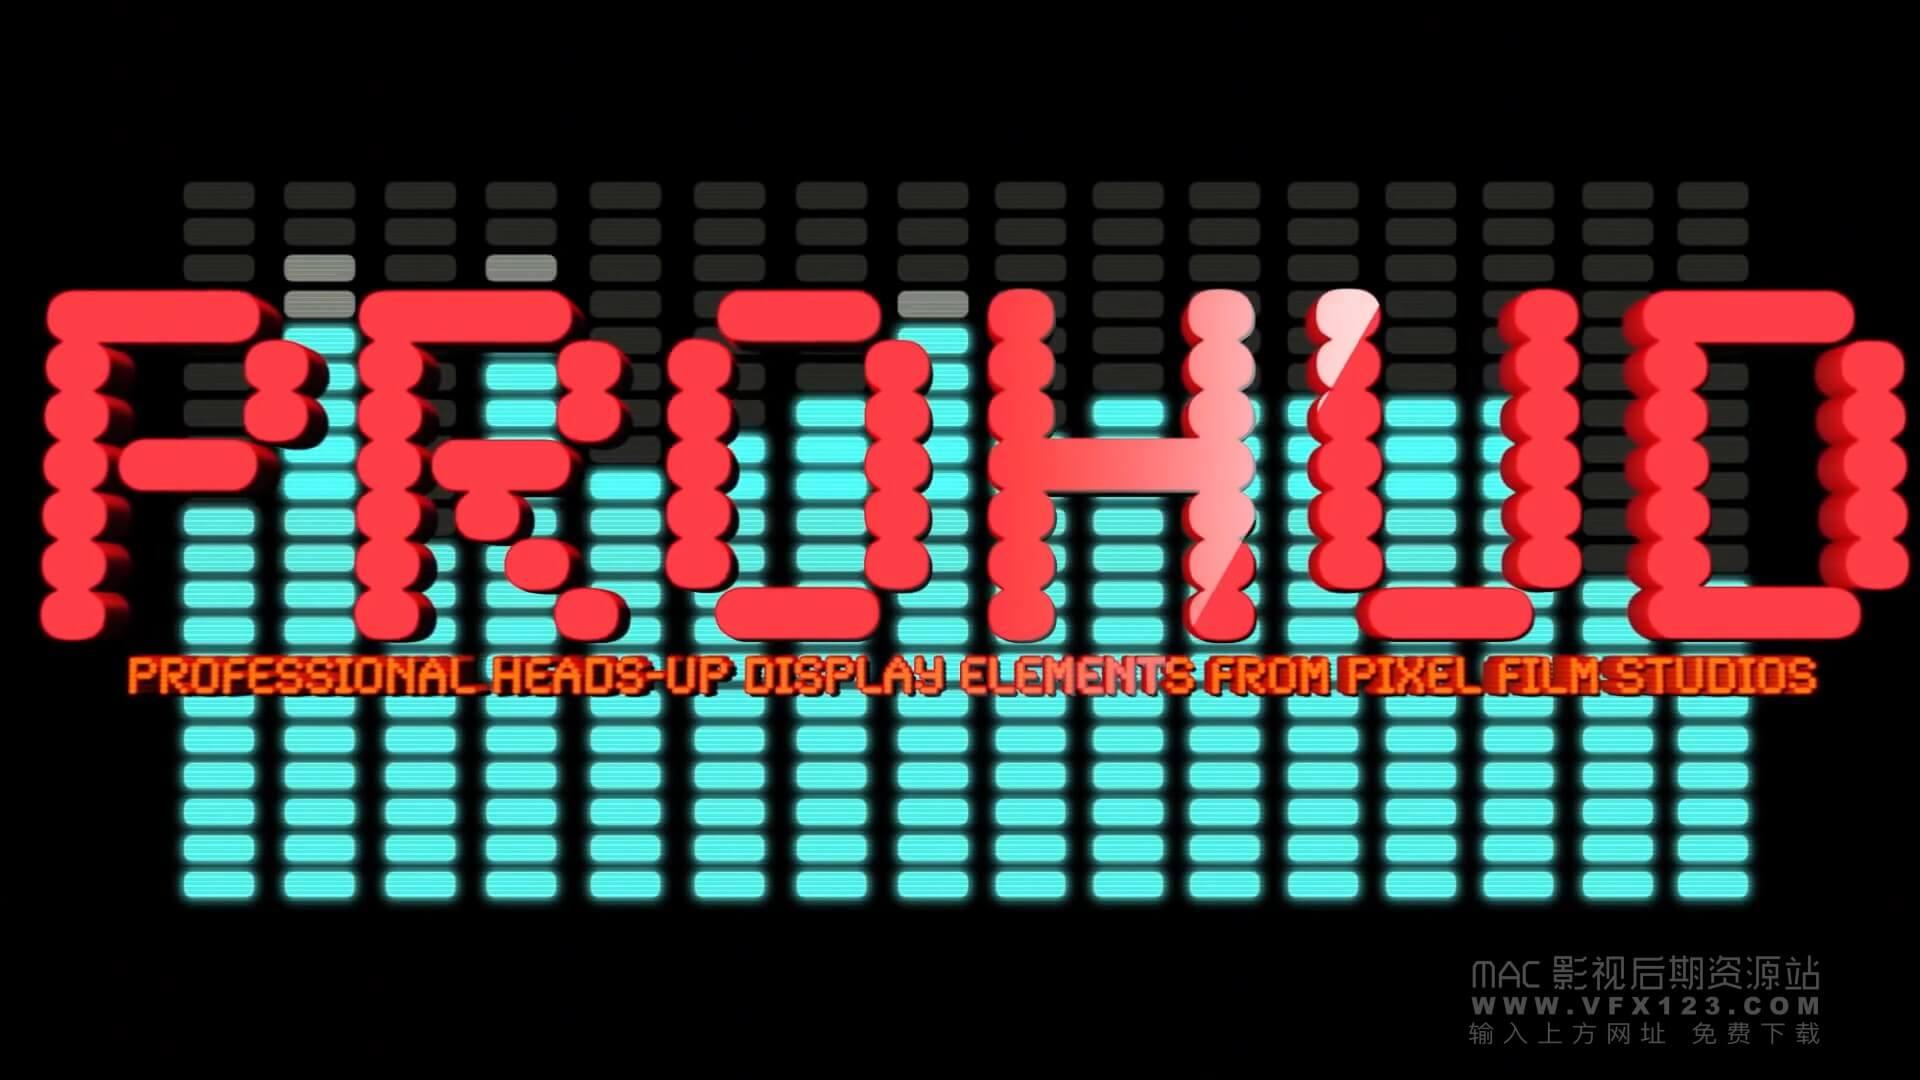 fcpx发生器 50组高科技信息化触控界面元素 ProHUD